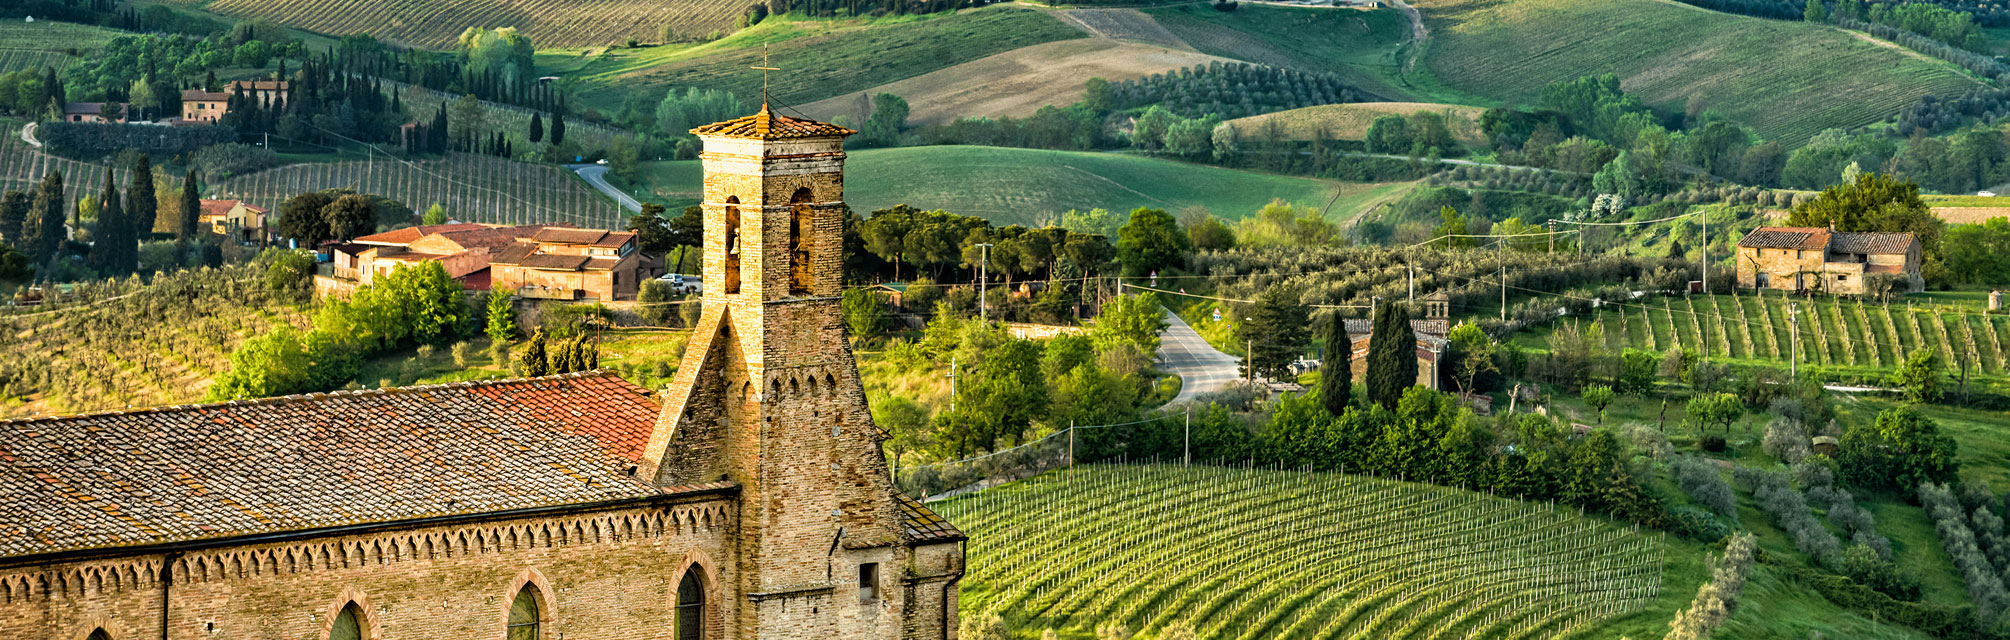 countryroadsofumbriaandtuscany_sangimignano_hero01.jpg